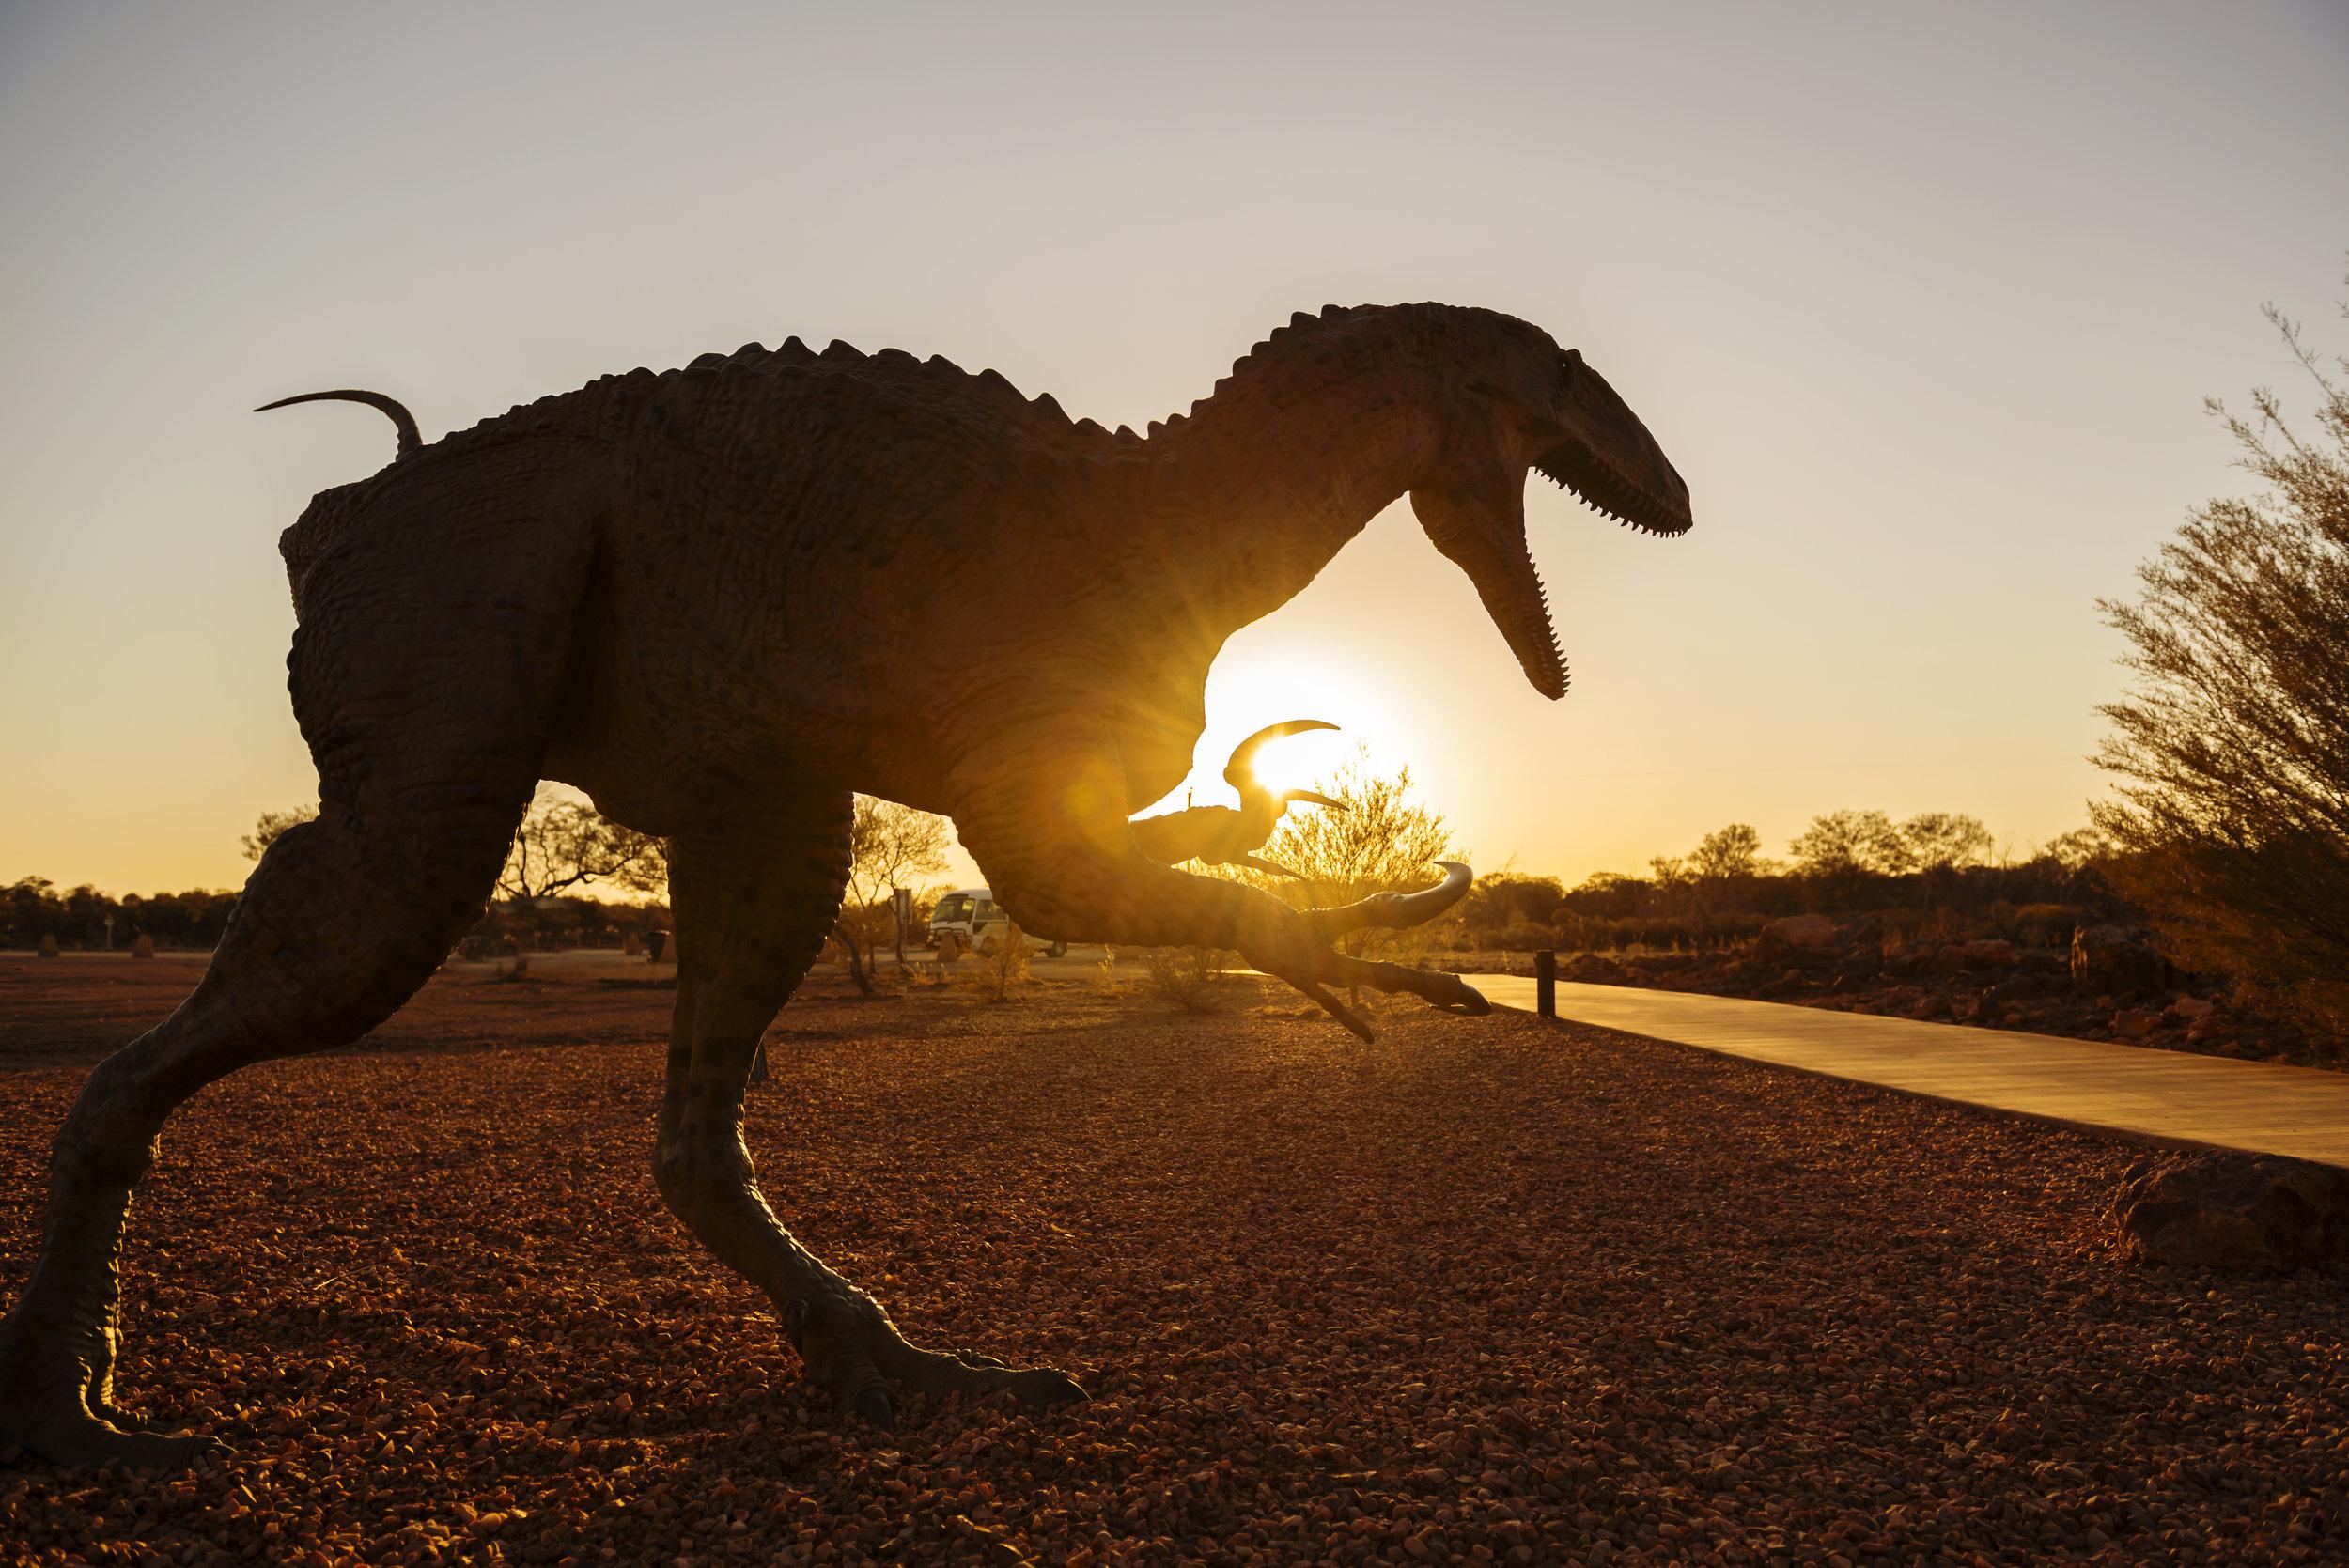 out-ageofdinosaurs-winton-iger-laurenepbath.jpg